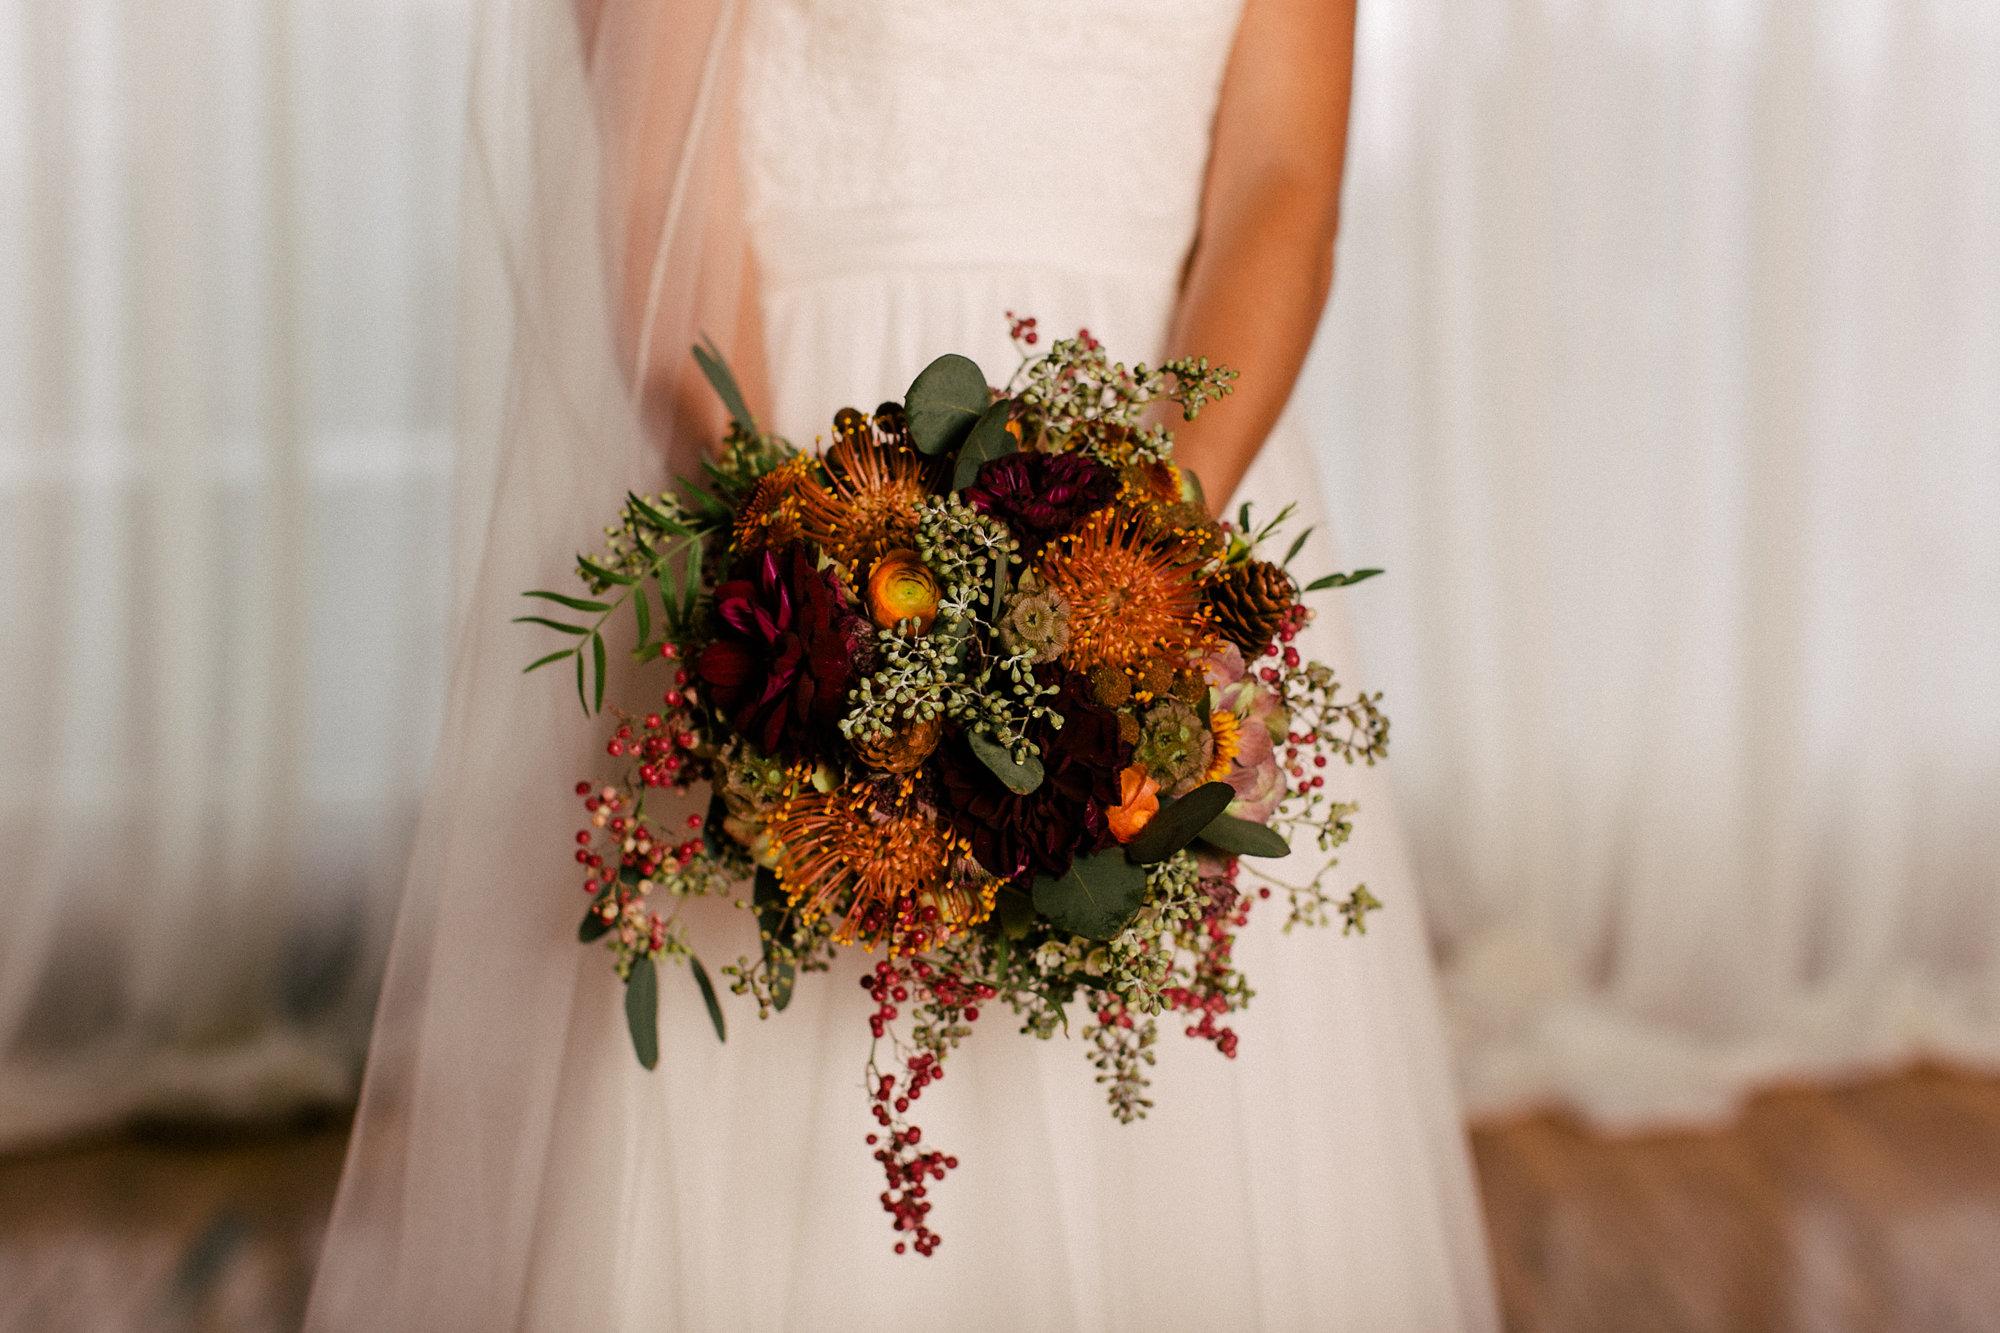 Fall bridal bouquet with pincushion protea, dahlias, and pinecones // Nashville Wedding Florist